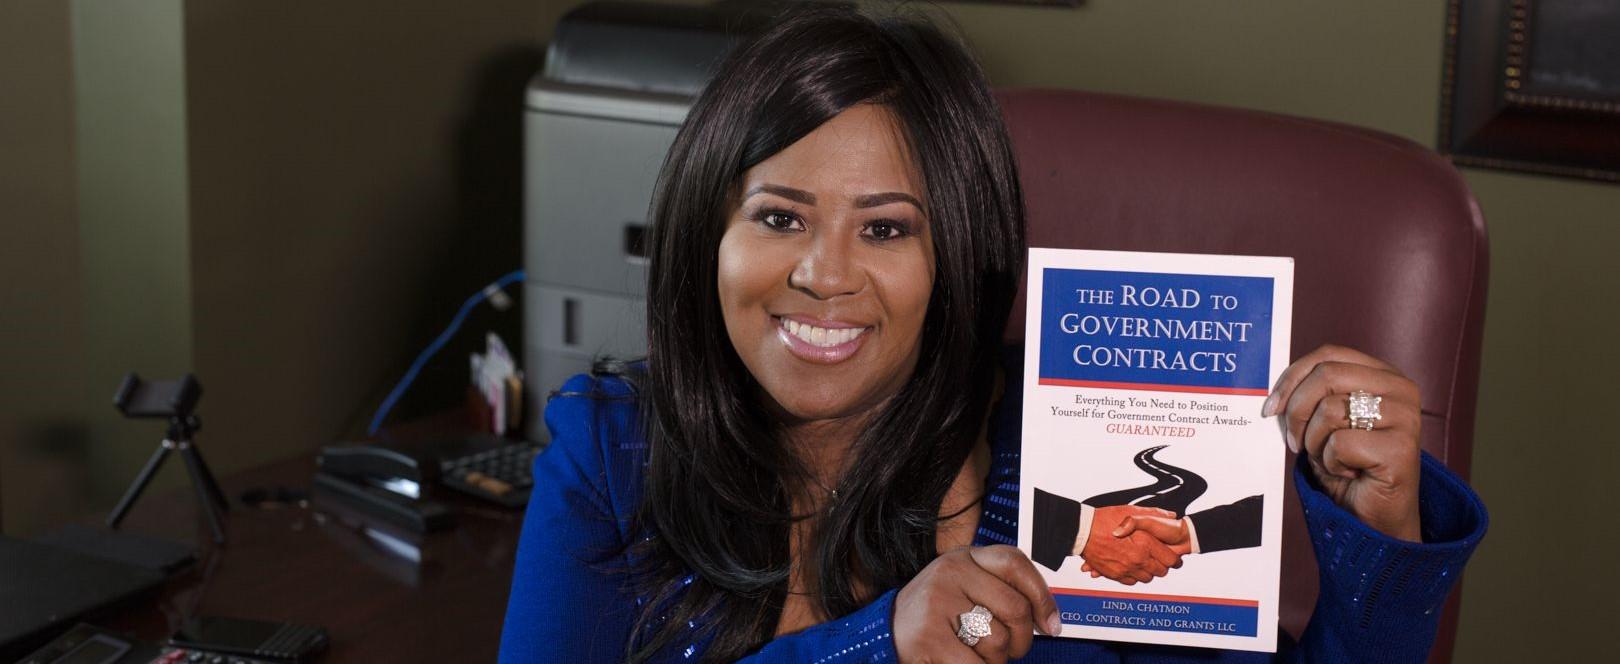 Linda Holding her book horizontal